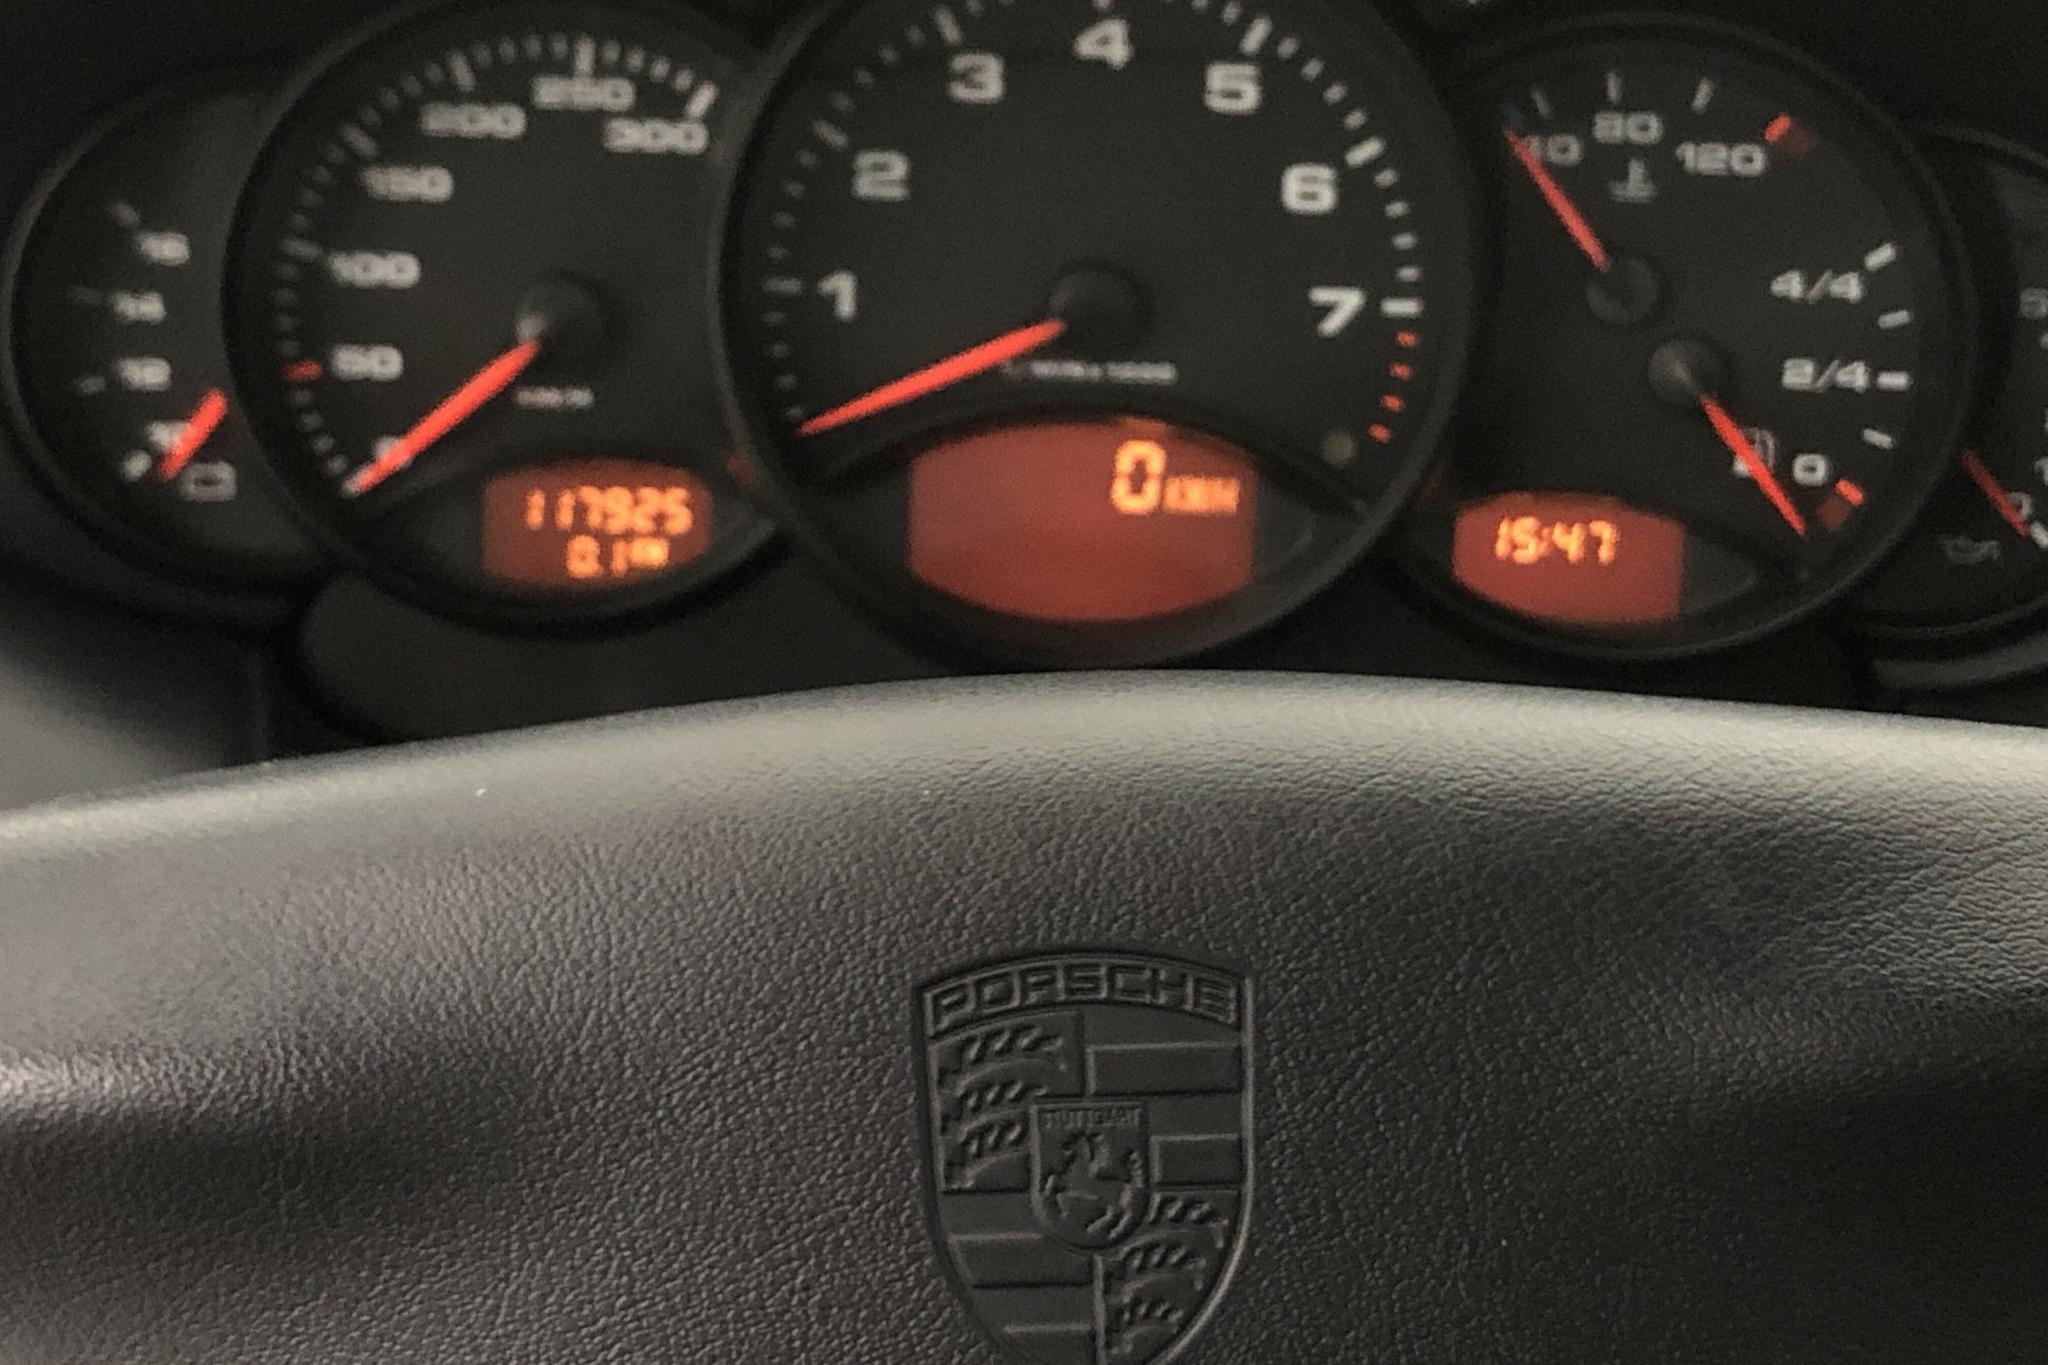 Porsche 911/996 Carrera 3.4 Coupé (301hk) - 11 792 mil - Manuell - silver - 2000